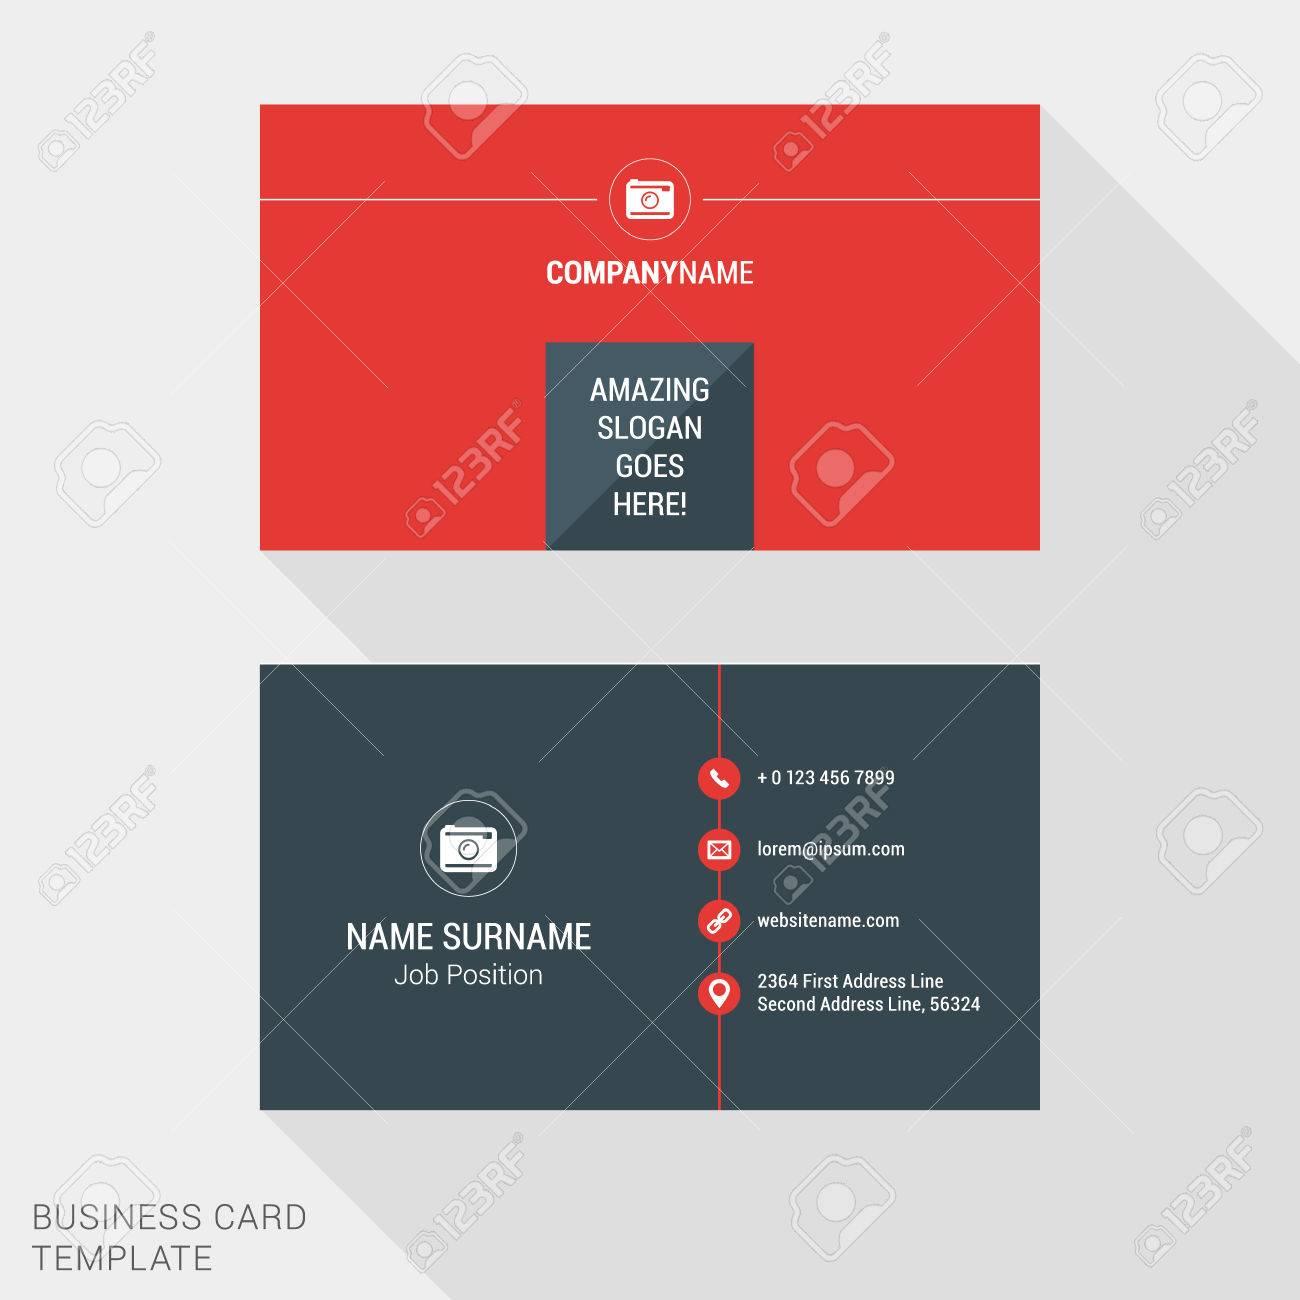 Modern creative and clean business card template in red color modern creative and clean business card template in red color flat style vector illustration stock colourmoves